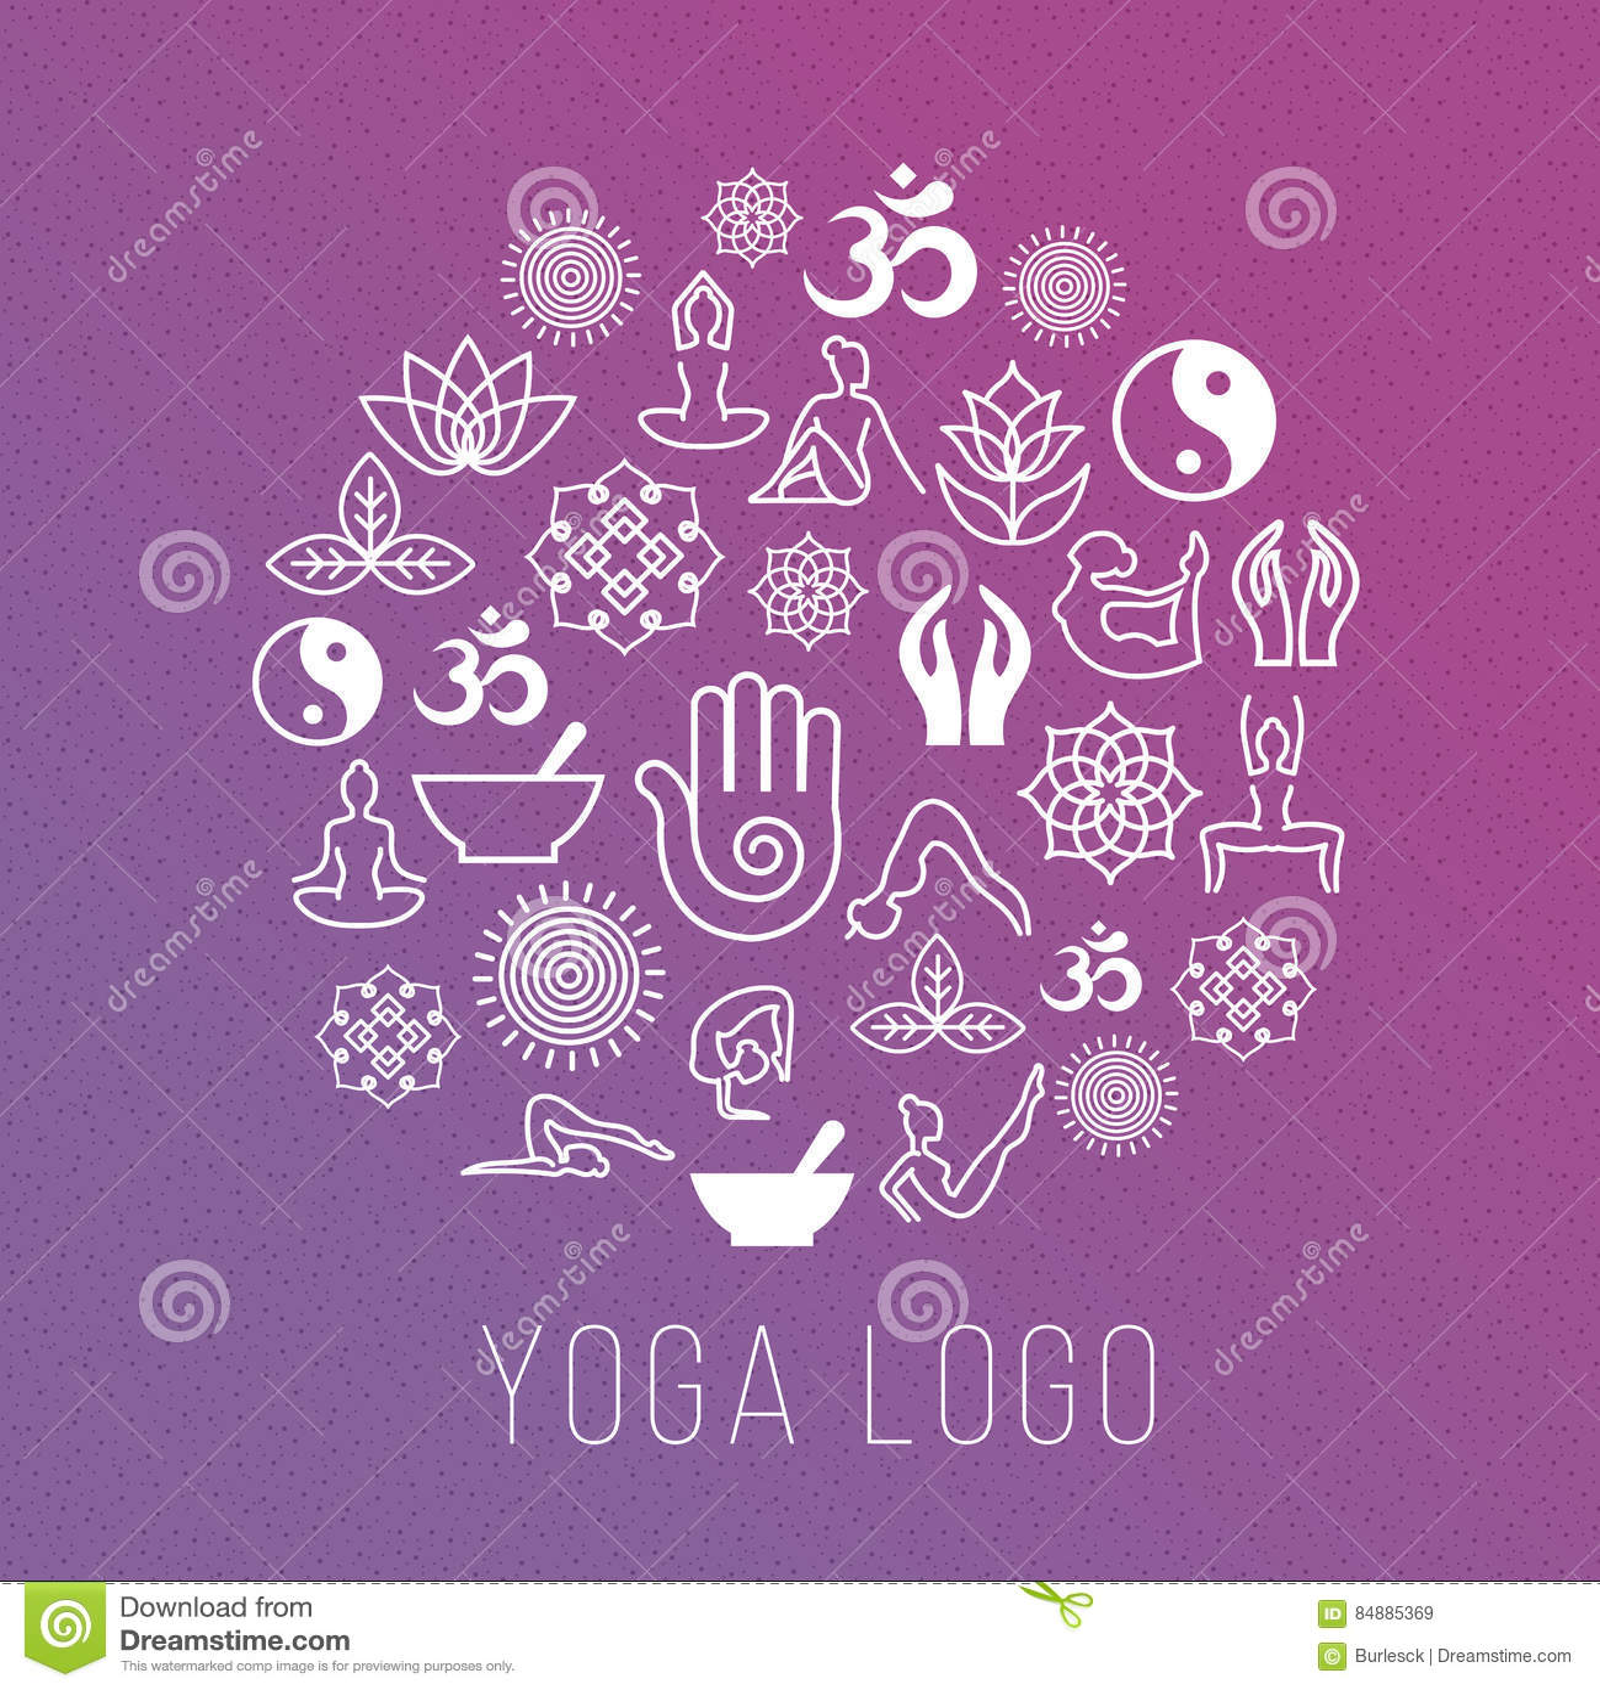 Spiritual symbols images images symbol and sign ideas spiritual harmony and balance icons yoga symbols zen buddhism yoga symbols in round label shape vector biocorpaavc